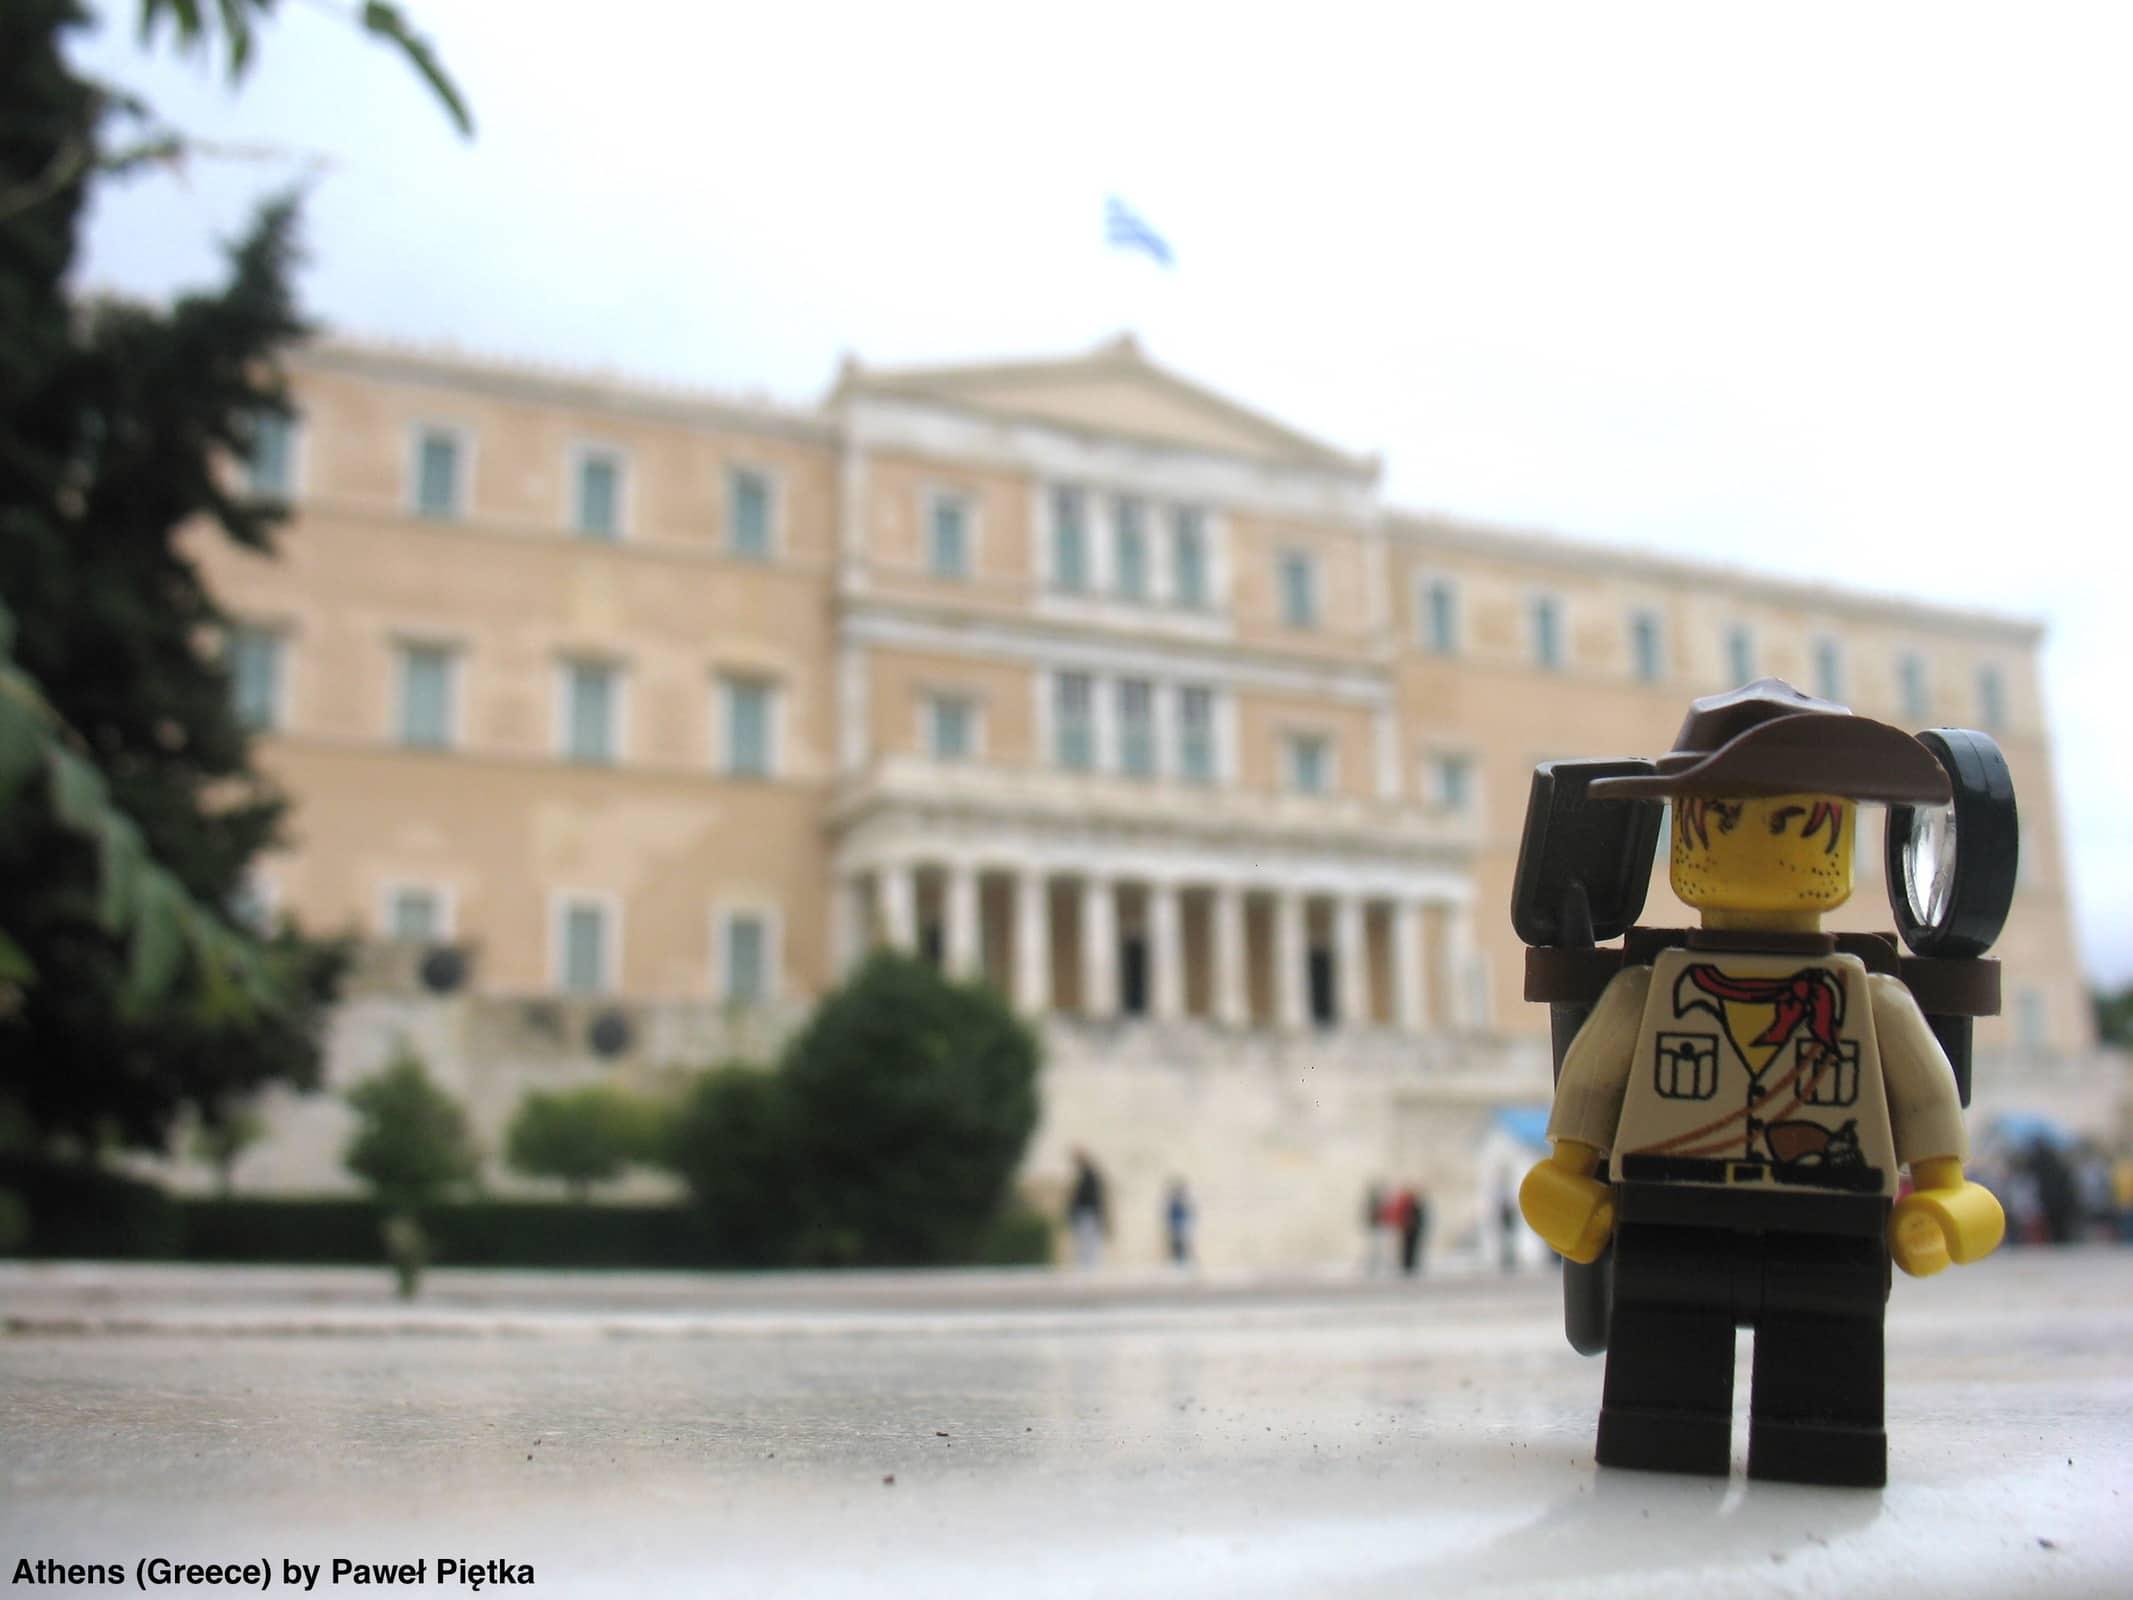 Athens (Greece) - Hellenic Parliament